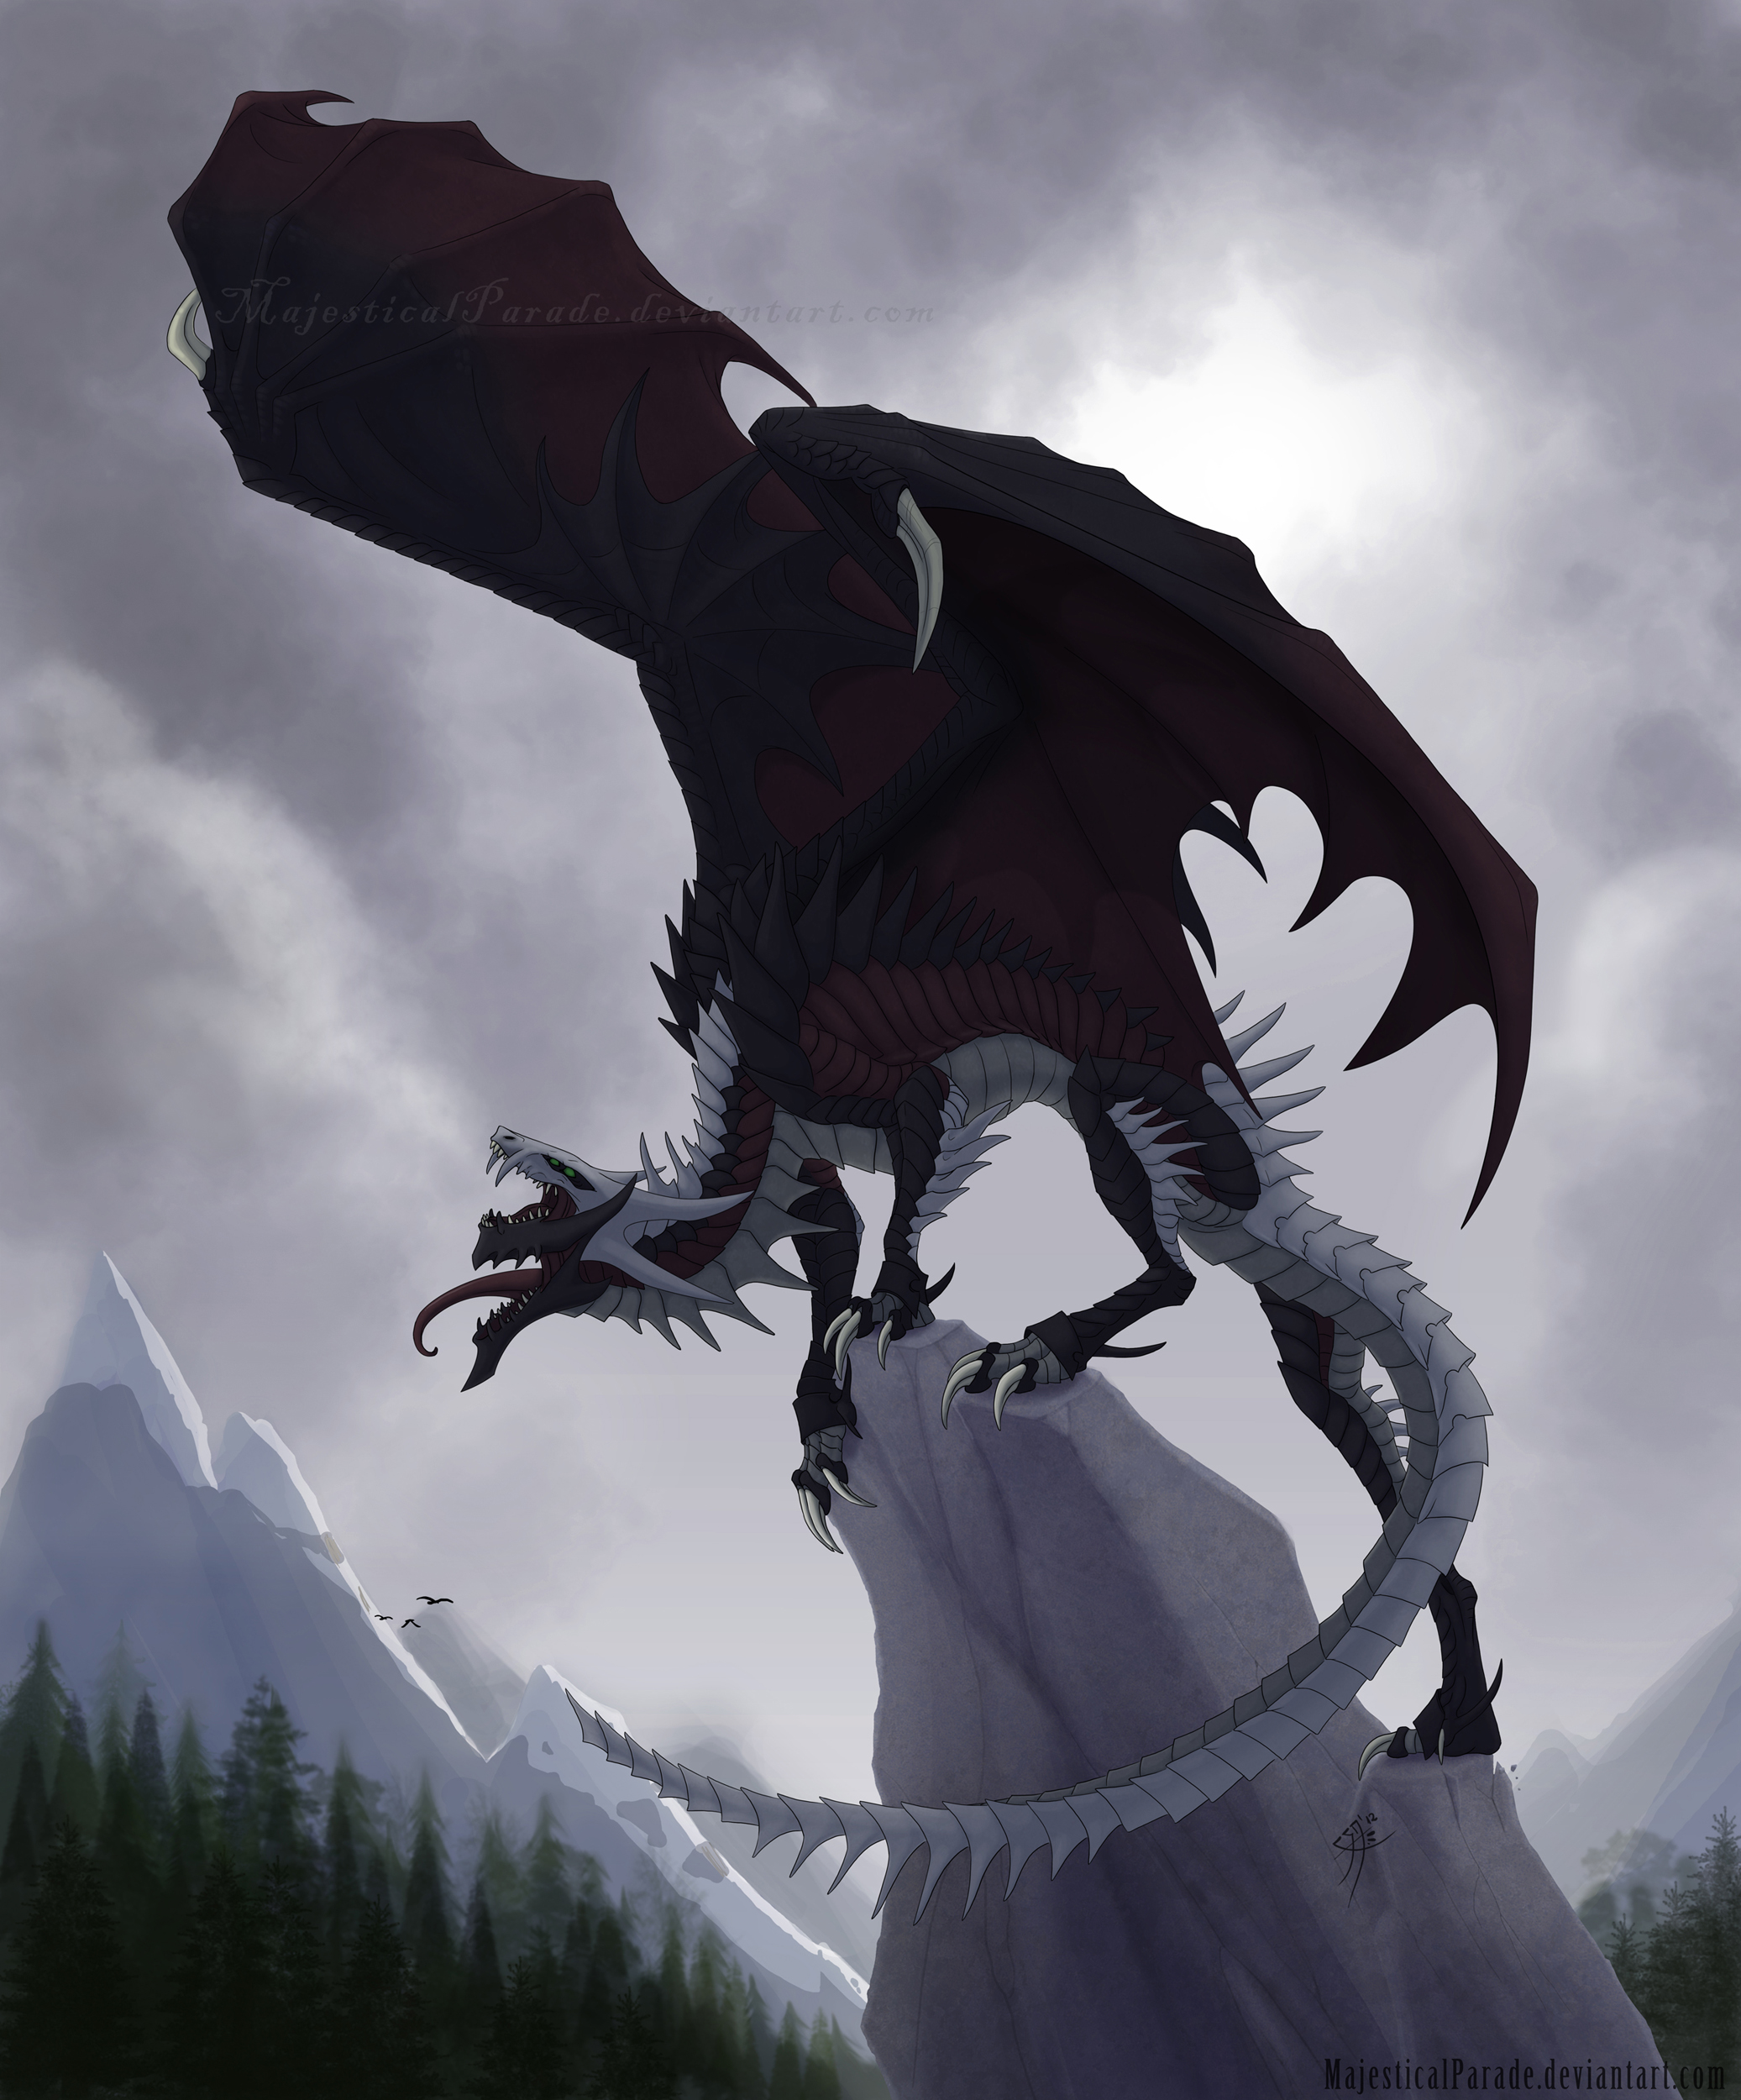 Mountain Roar by majesticalparade